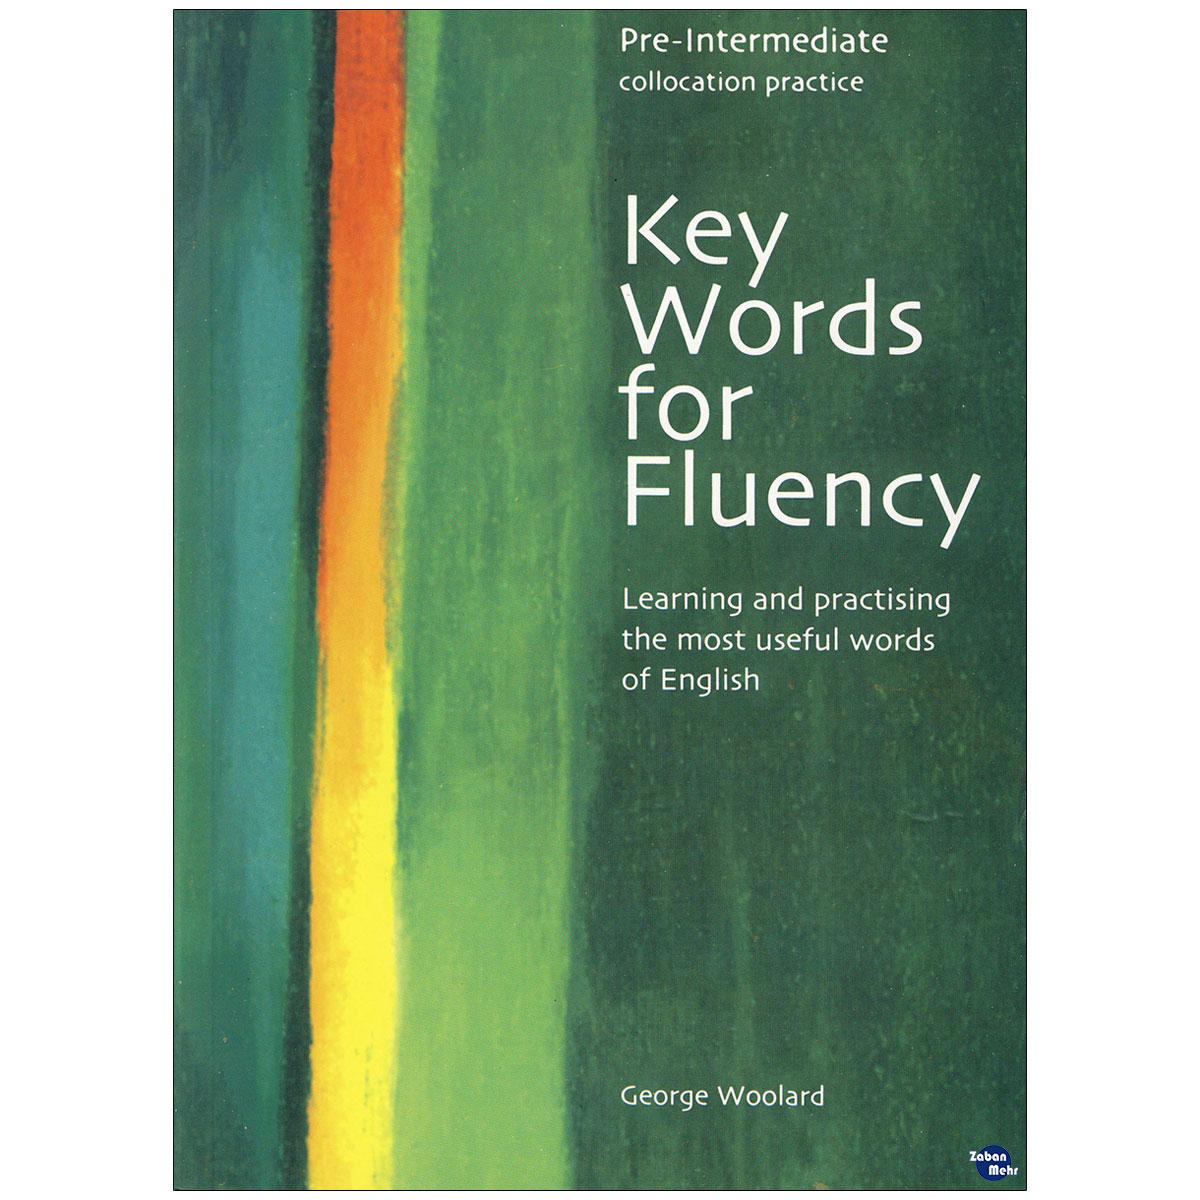 خرید                      کتاب Key Words for Fluency pre intermediate اثر Gorge Woolard انتشارات زبان مهر